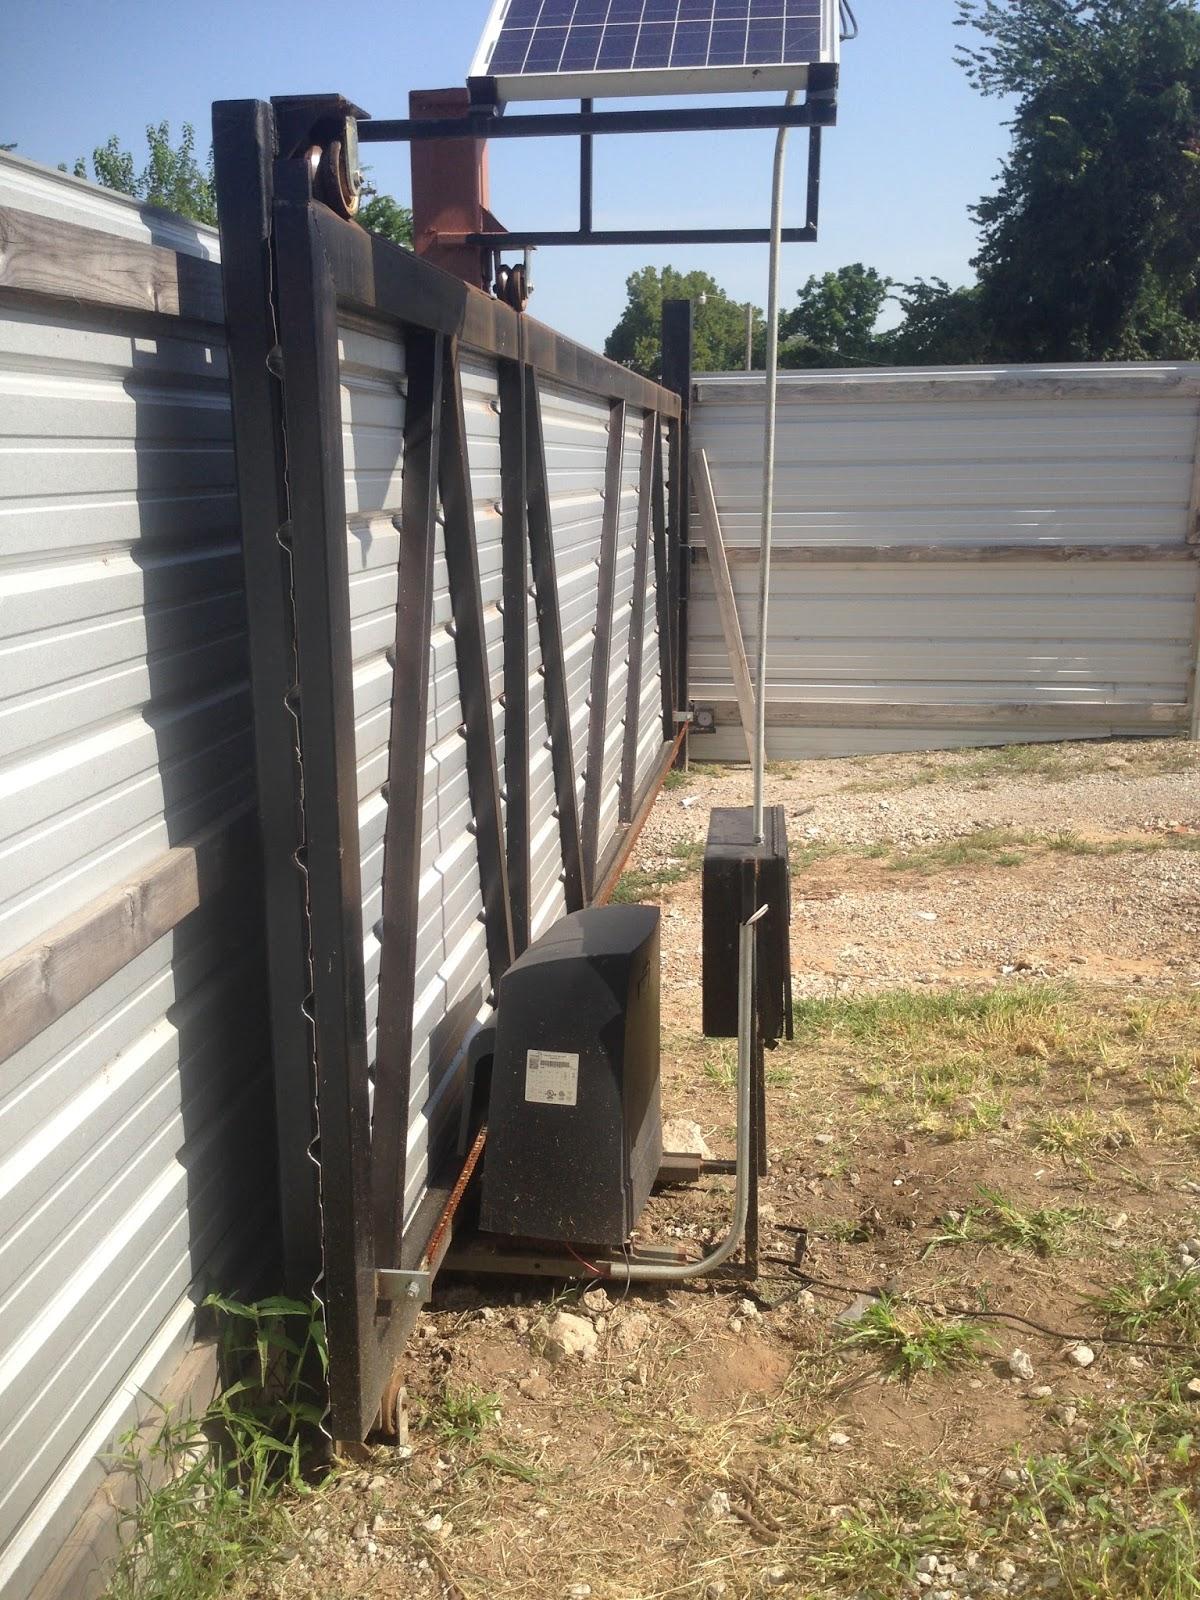 K slide gate operator solar conversion